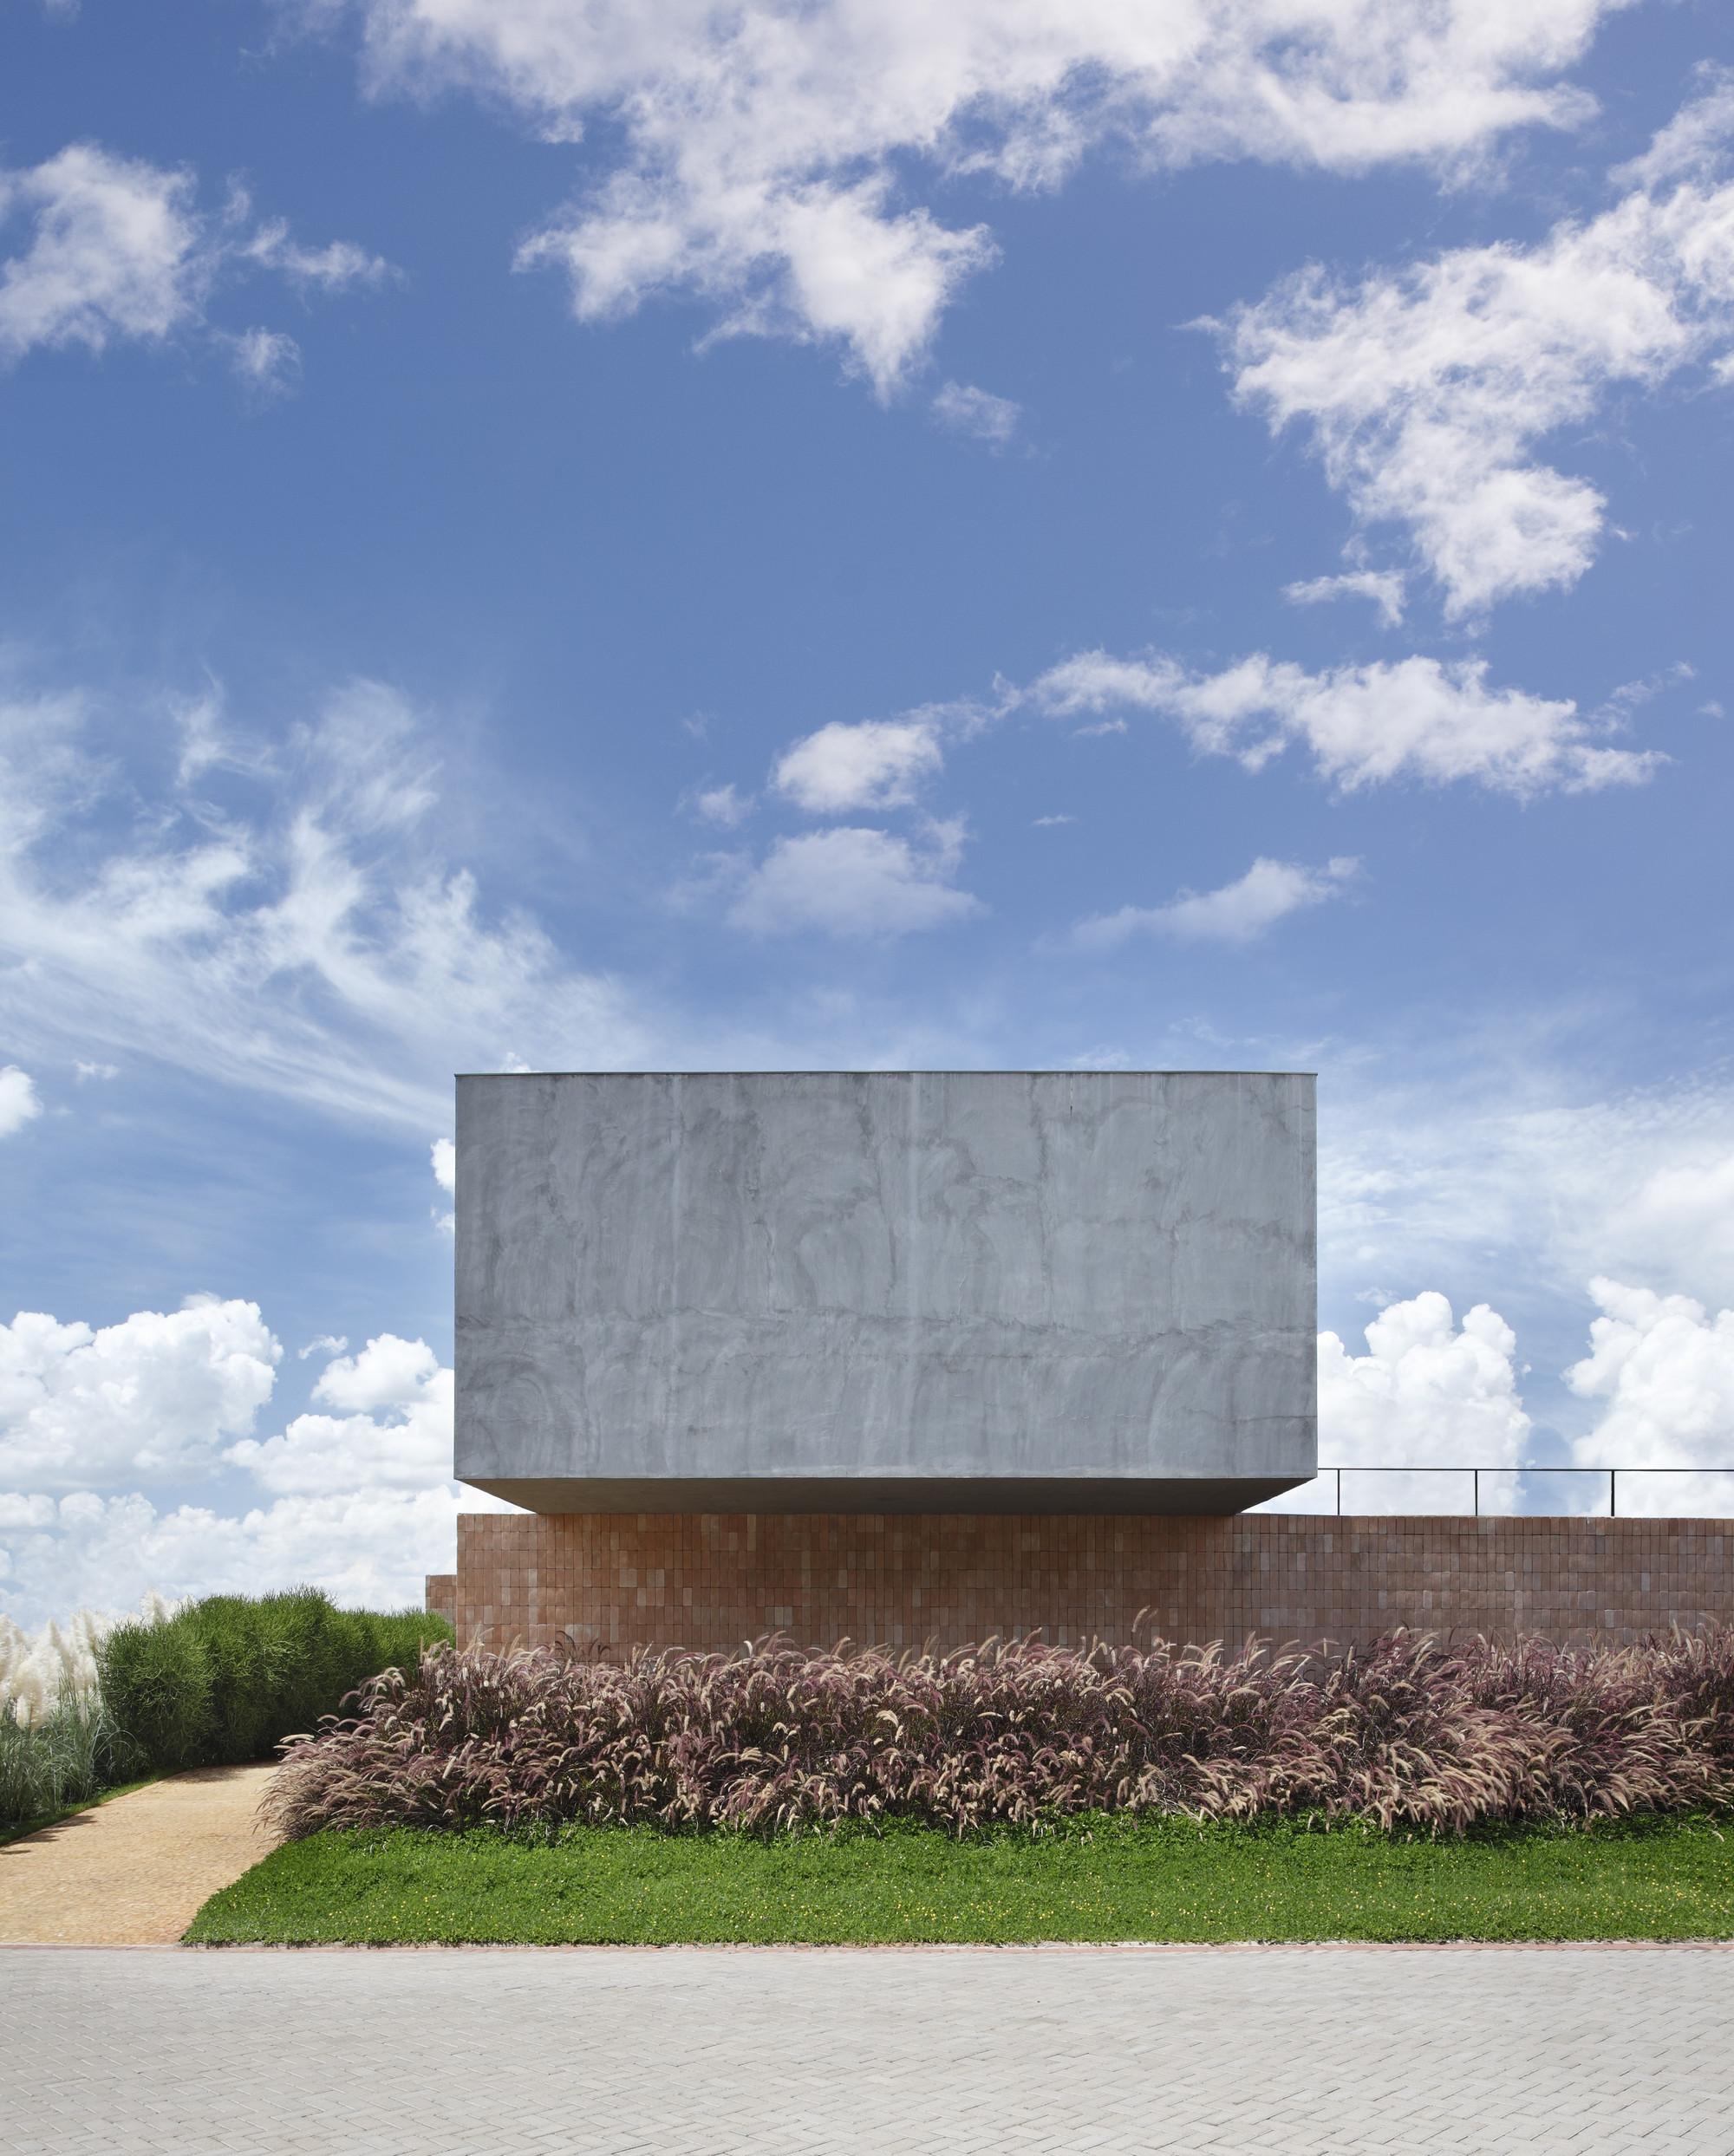 Galeria de casa bt studio guilherme torres 11 for Minimalist house escape 4